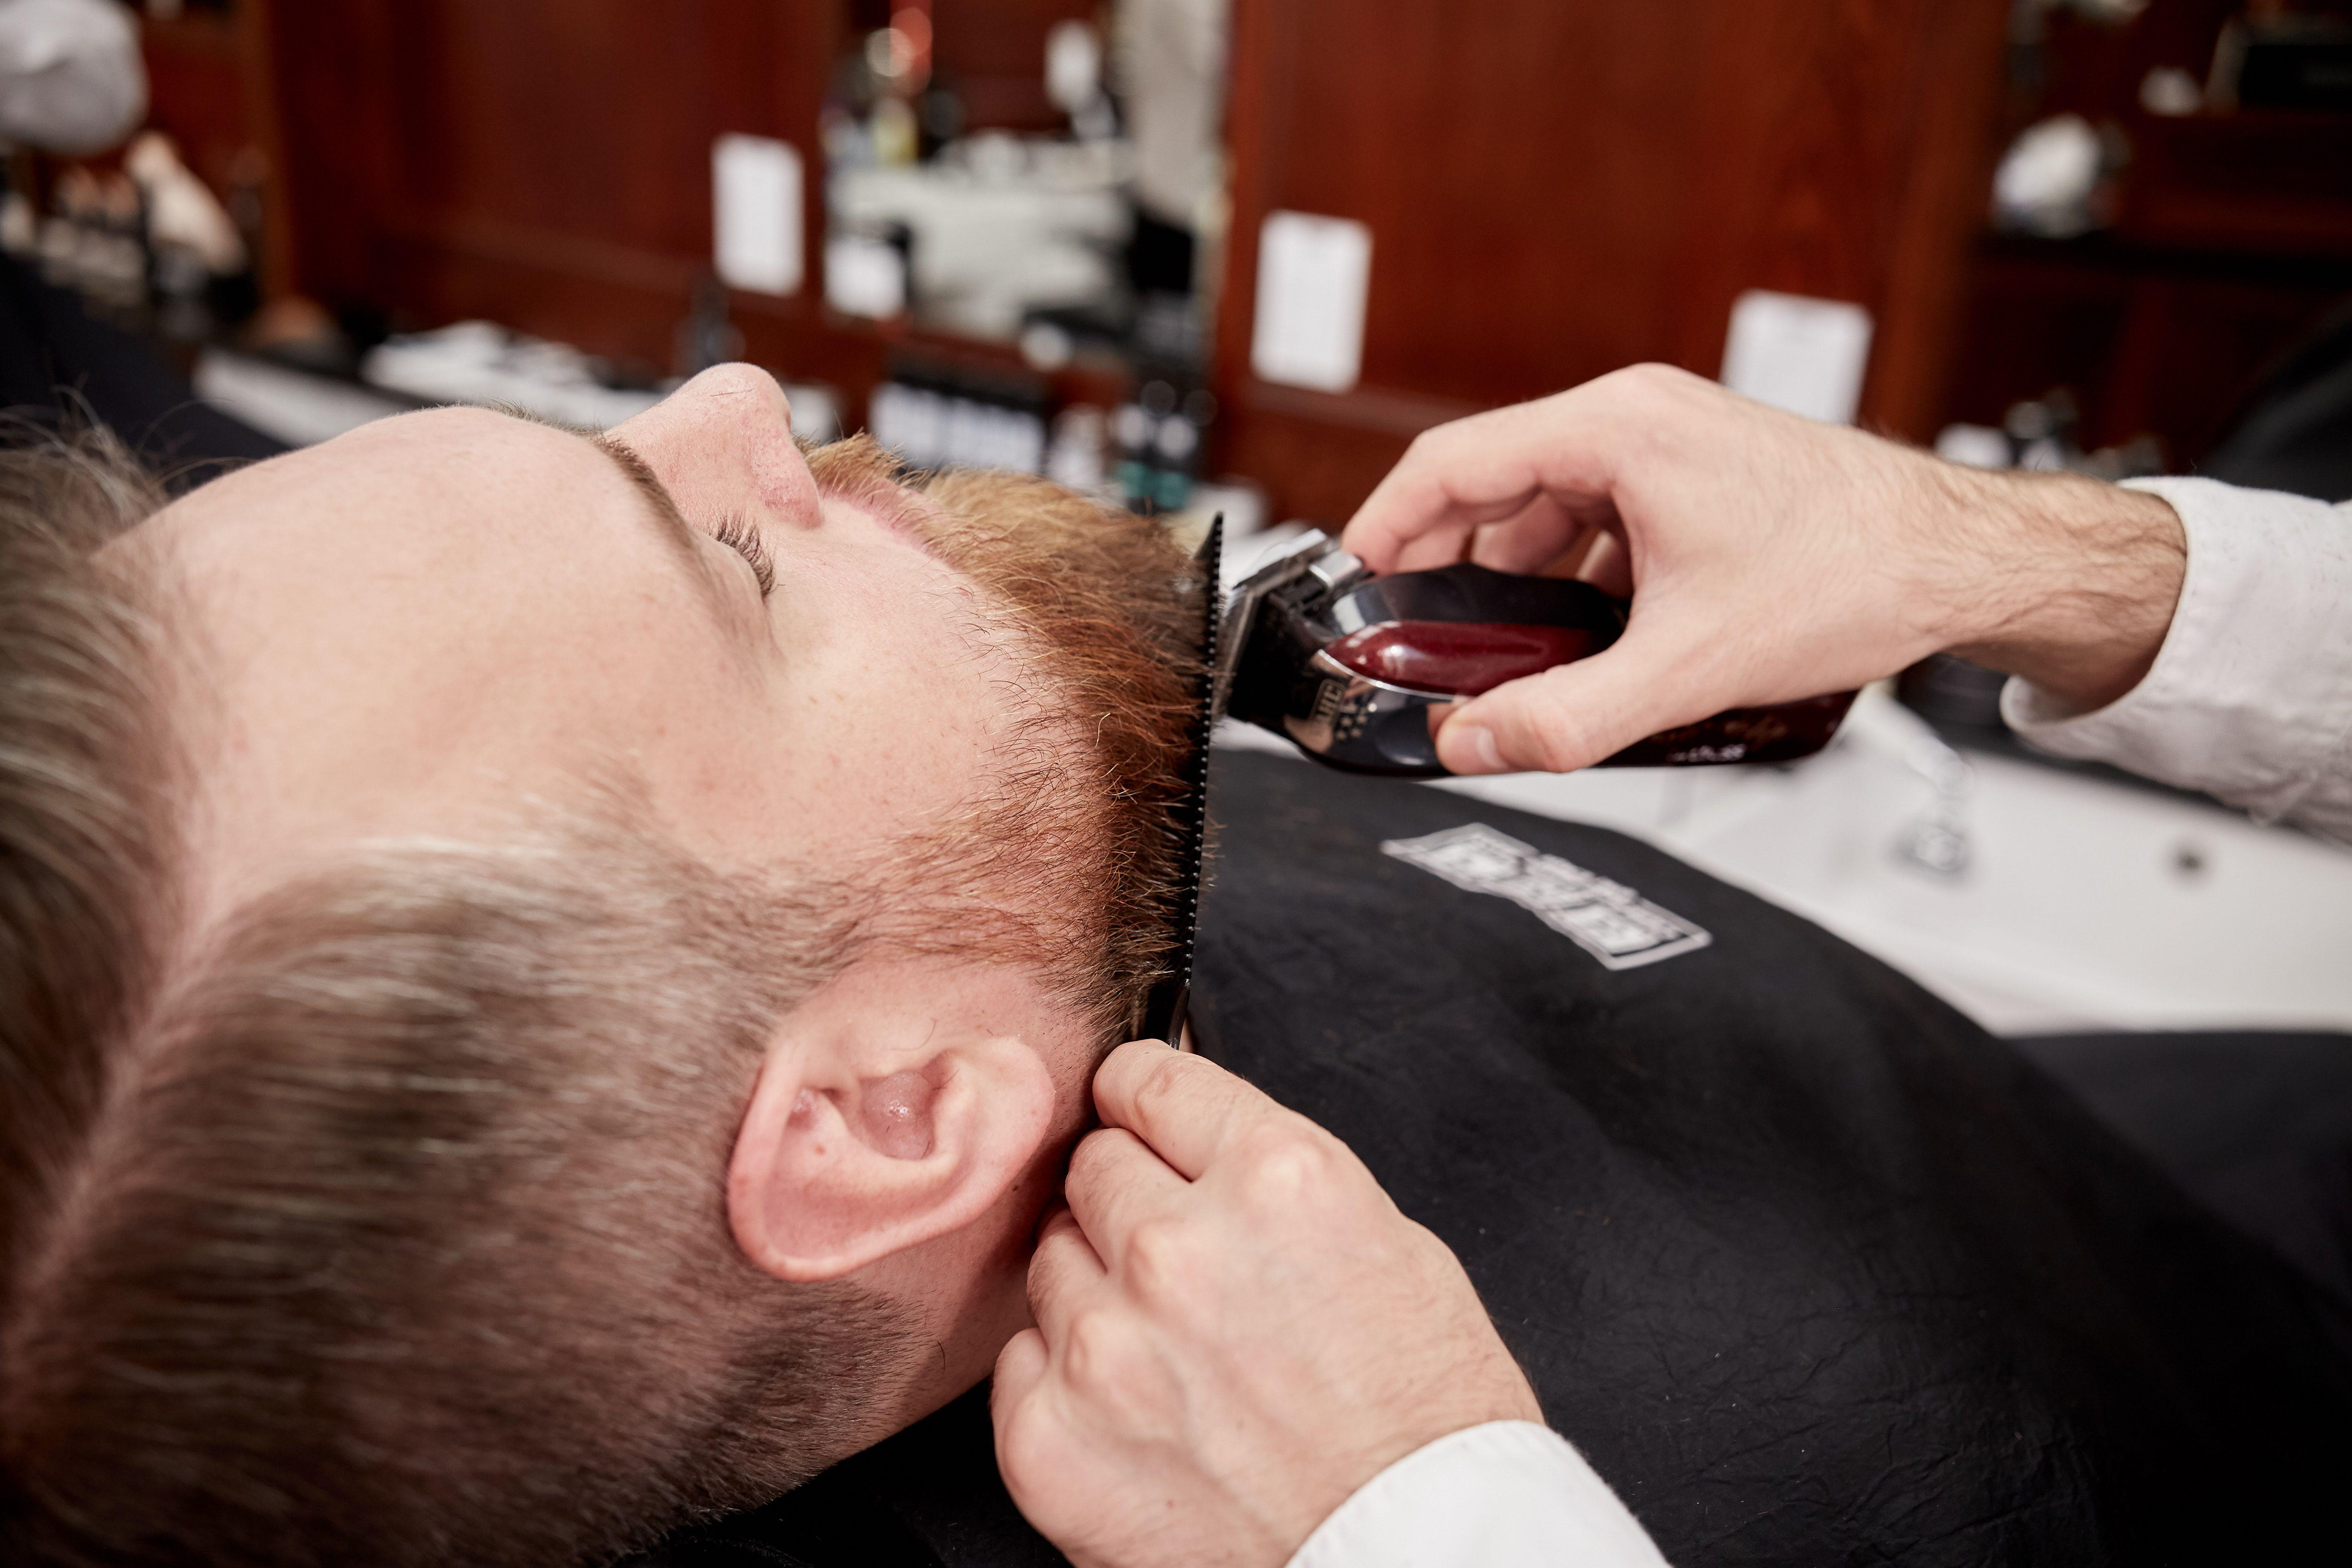 Barber Shopnyc Best Barbers Near Me Nyc Best Barbers Midtown Rockefeller Barbers Near Me In 2020 Best Barber Best Barber Shop Barber Shop Haircuts